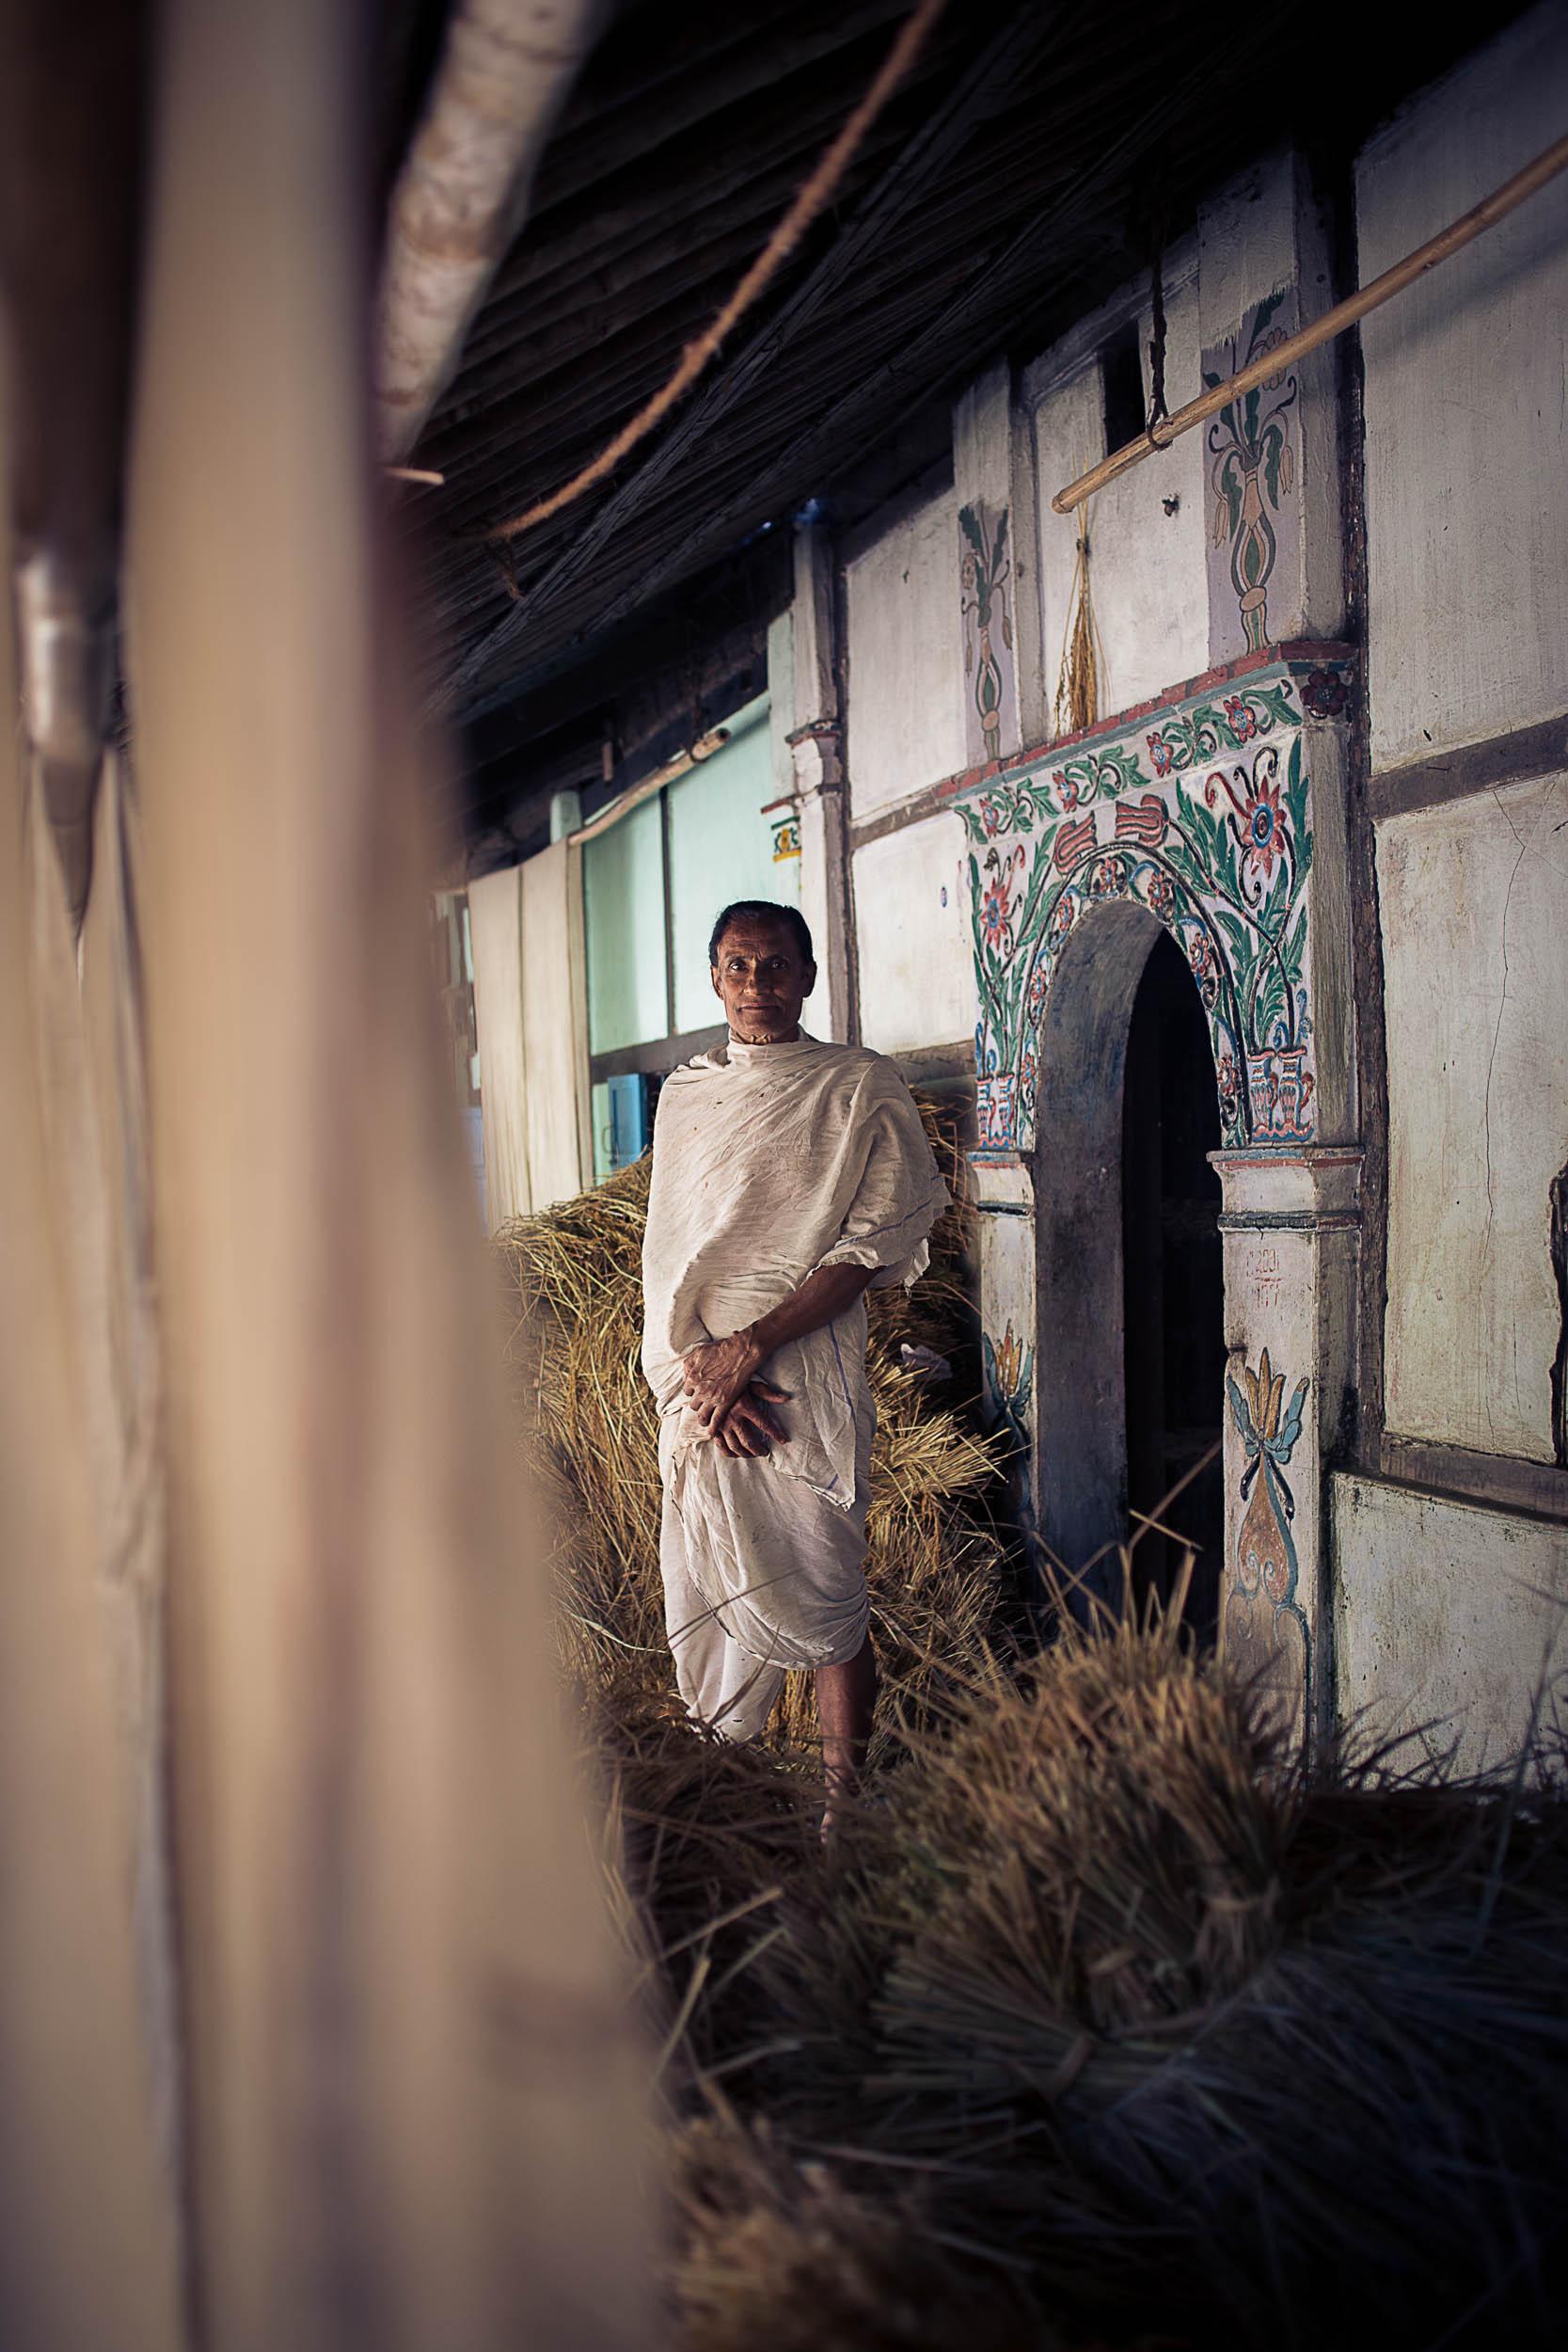 Sindhur_Photography_Travel_People_Majuli-65.JPG